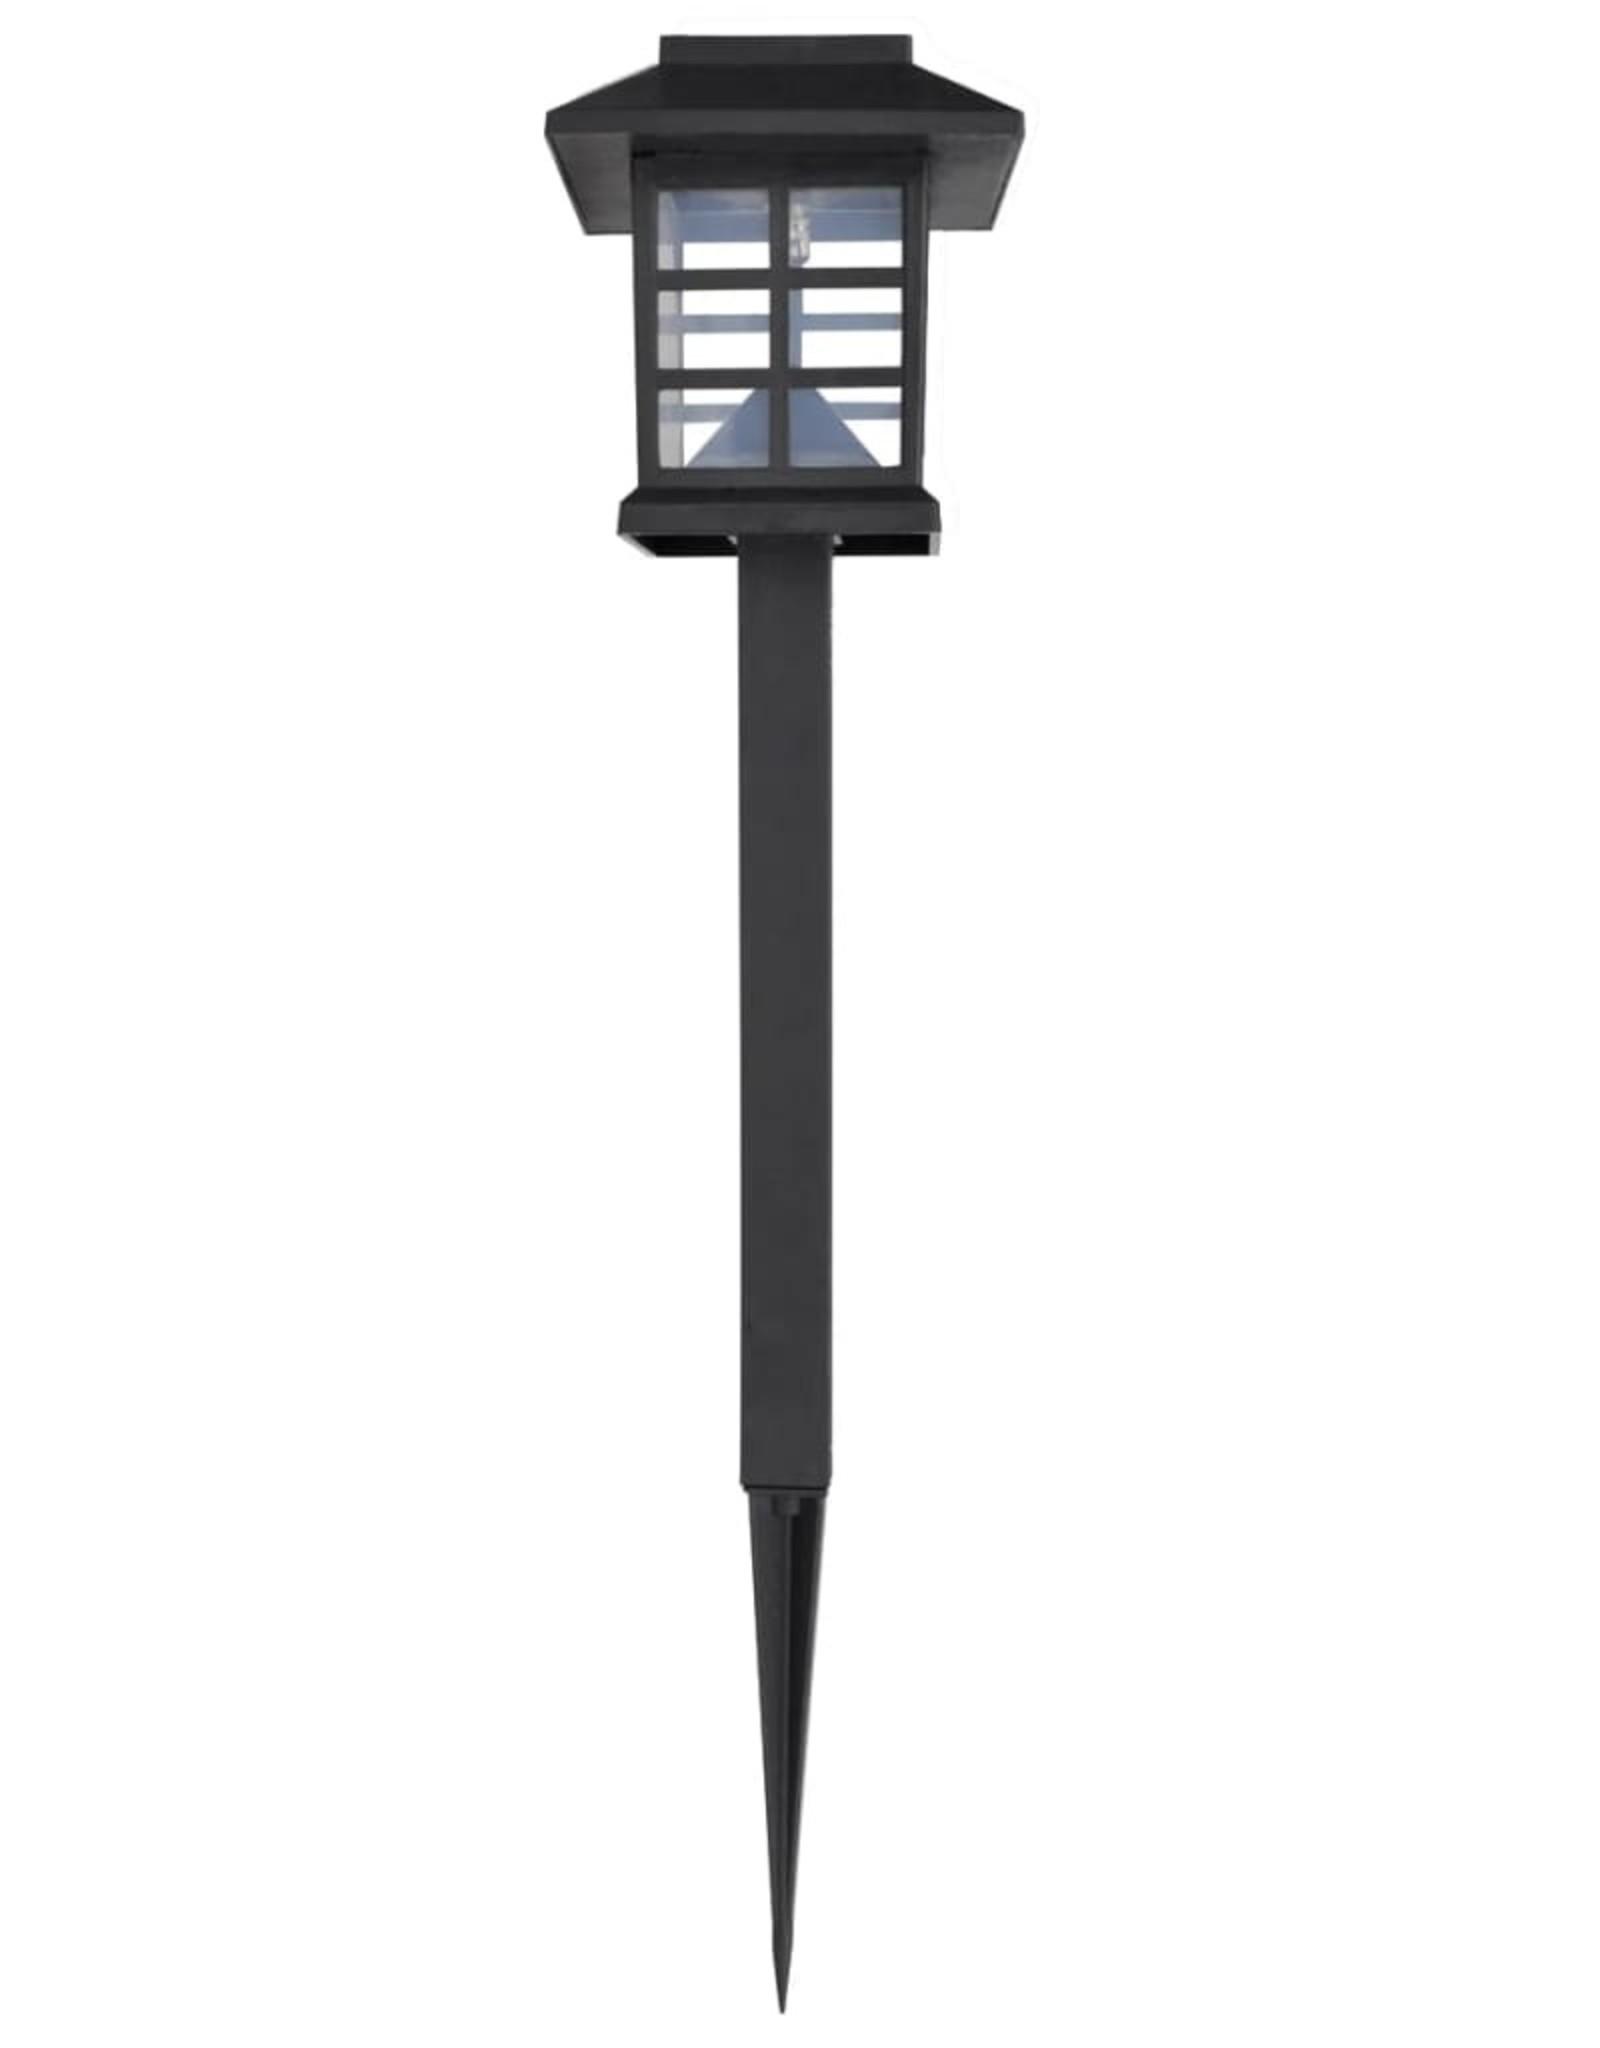 vidaXL 12-delige LED-tuinverlichtingsset solar met pin 8,6x8,6x38 cm